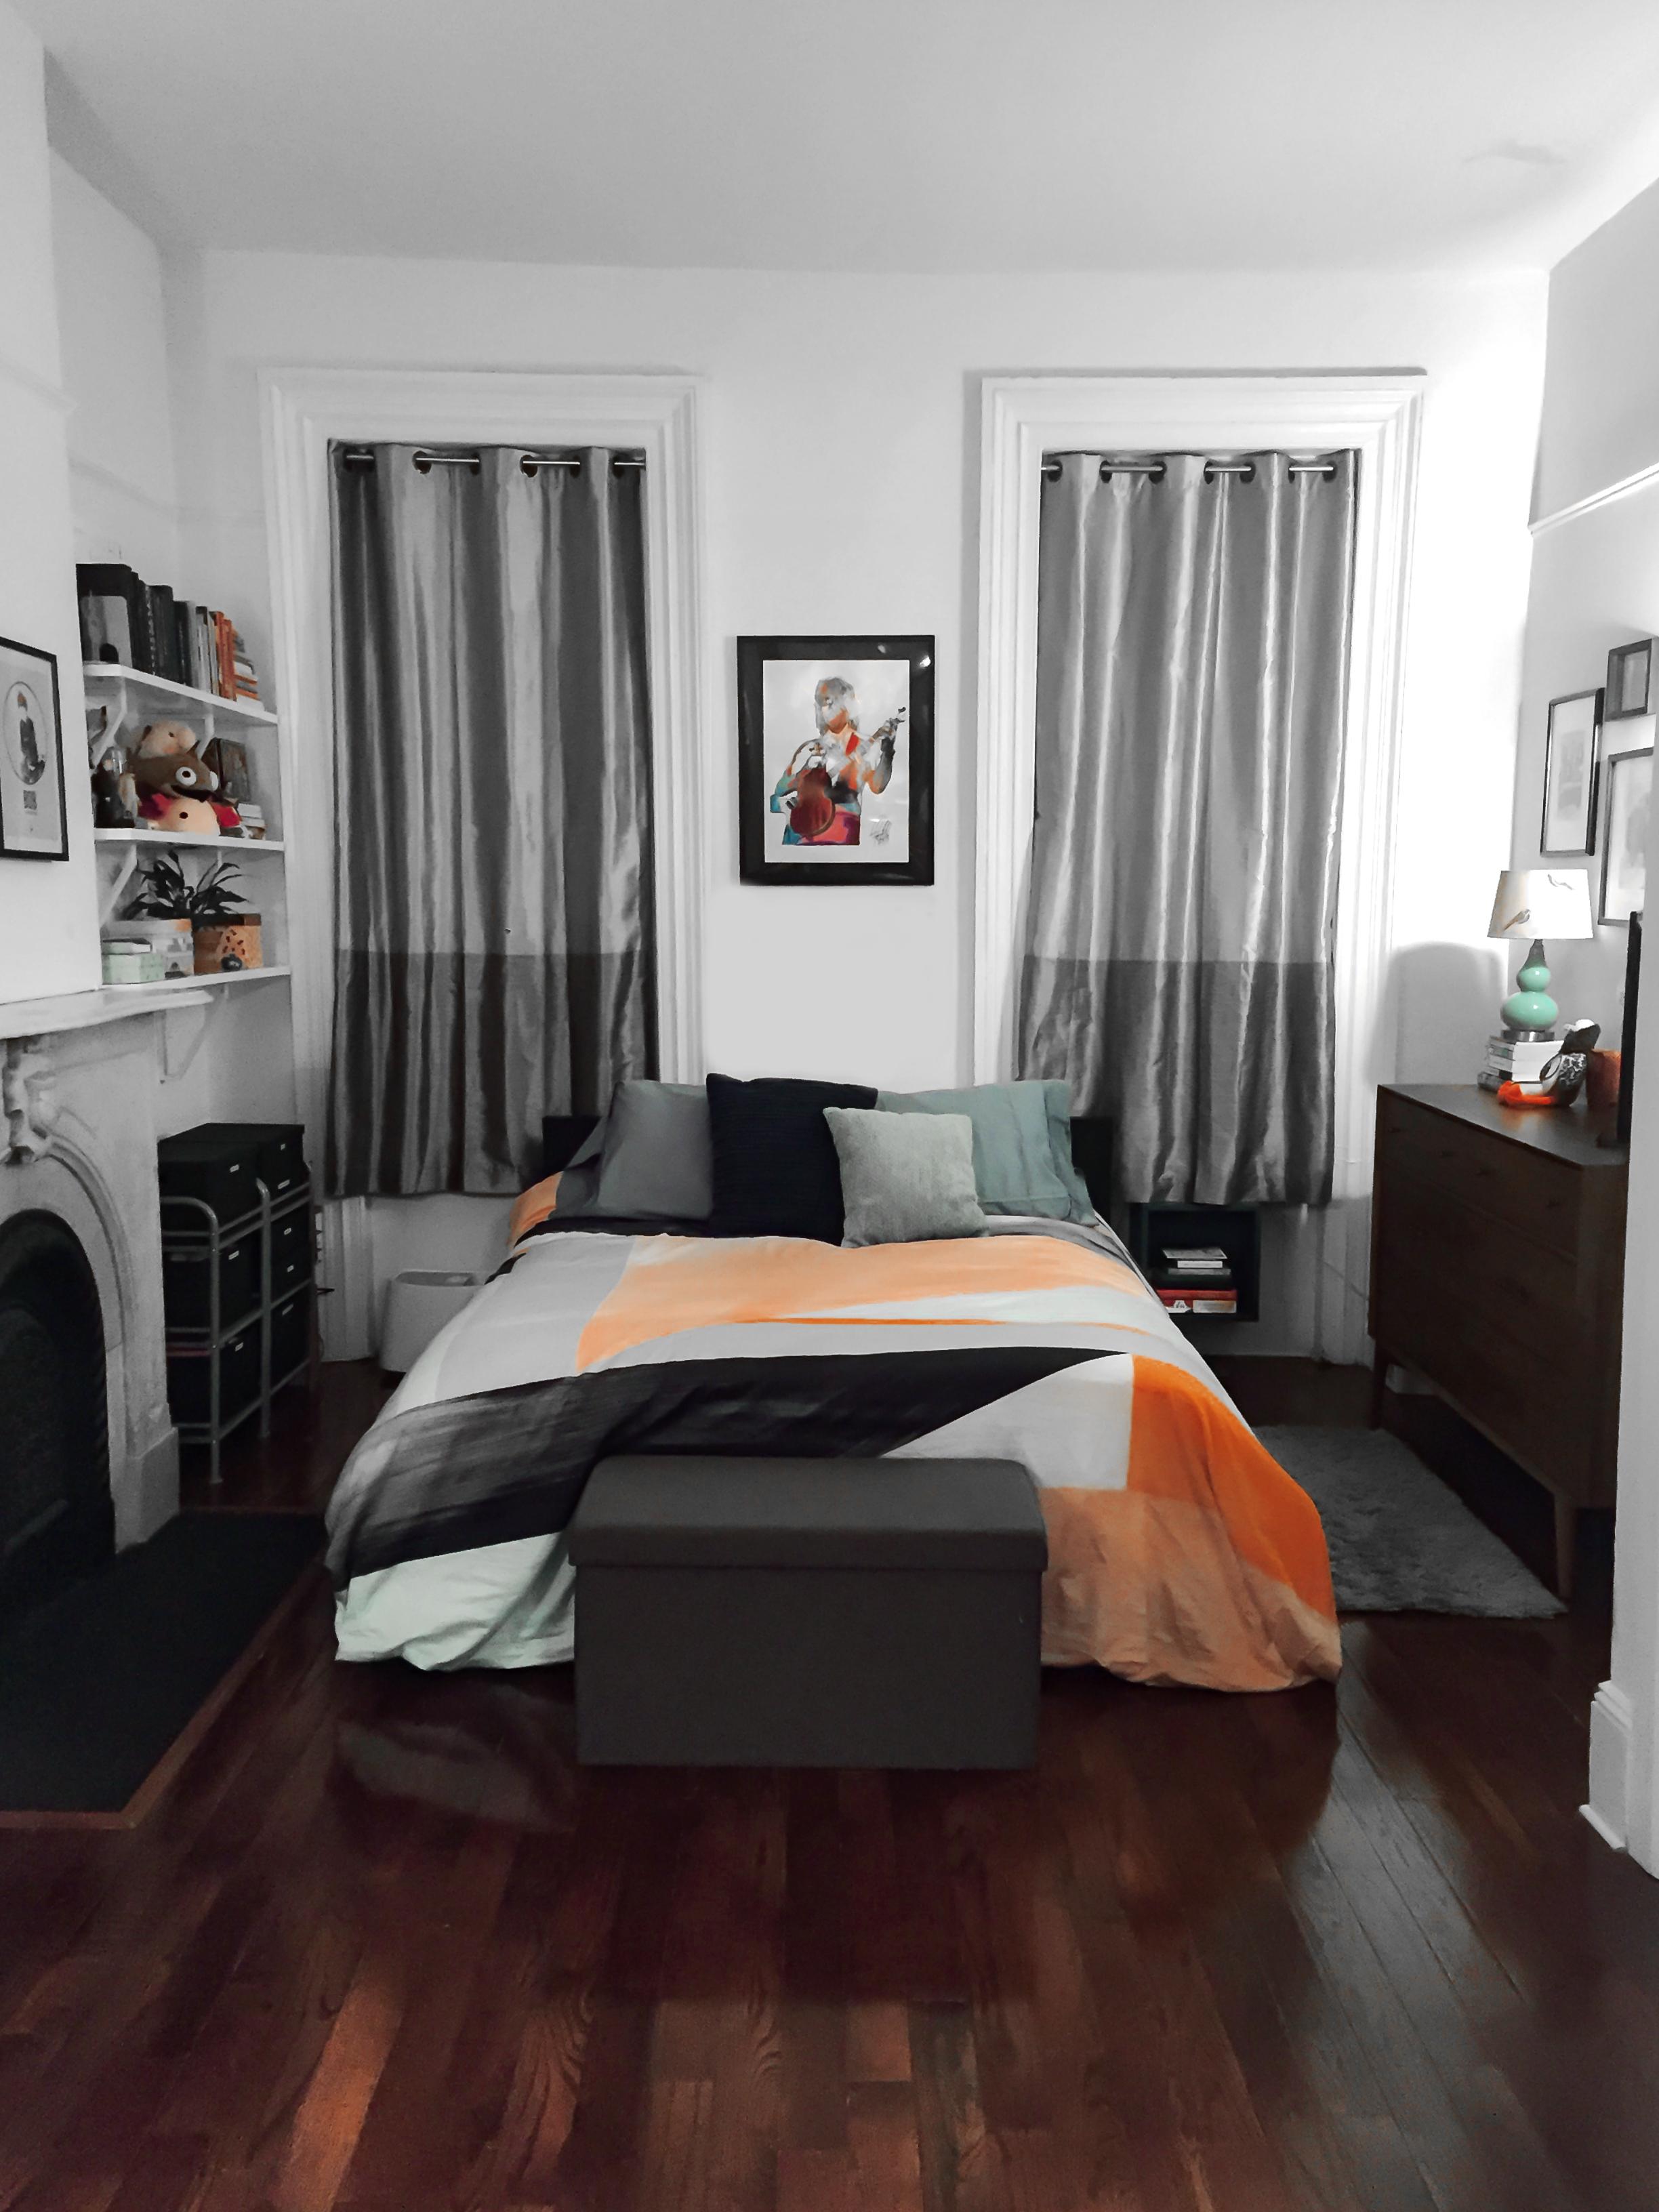 1bedroom after.jpg